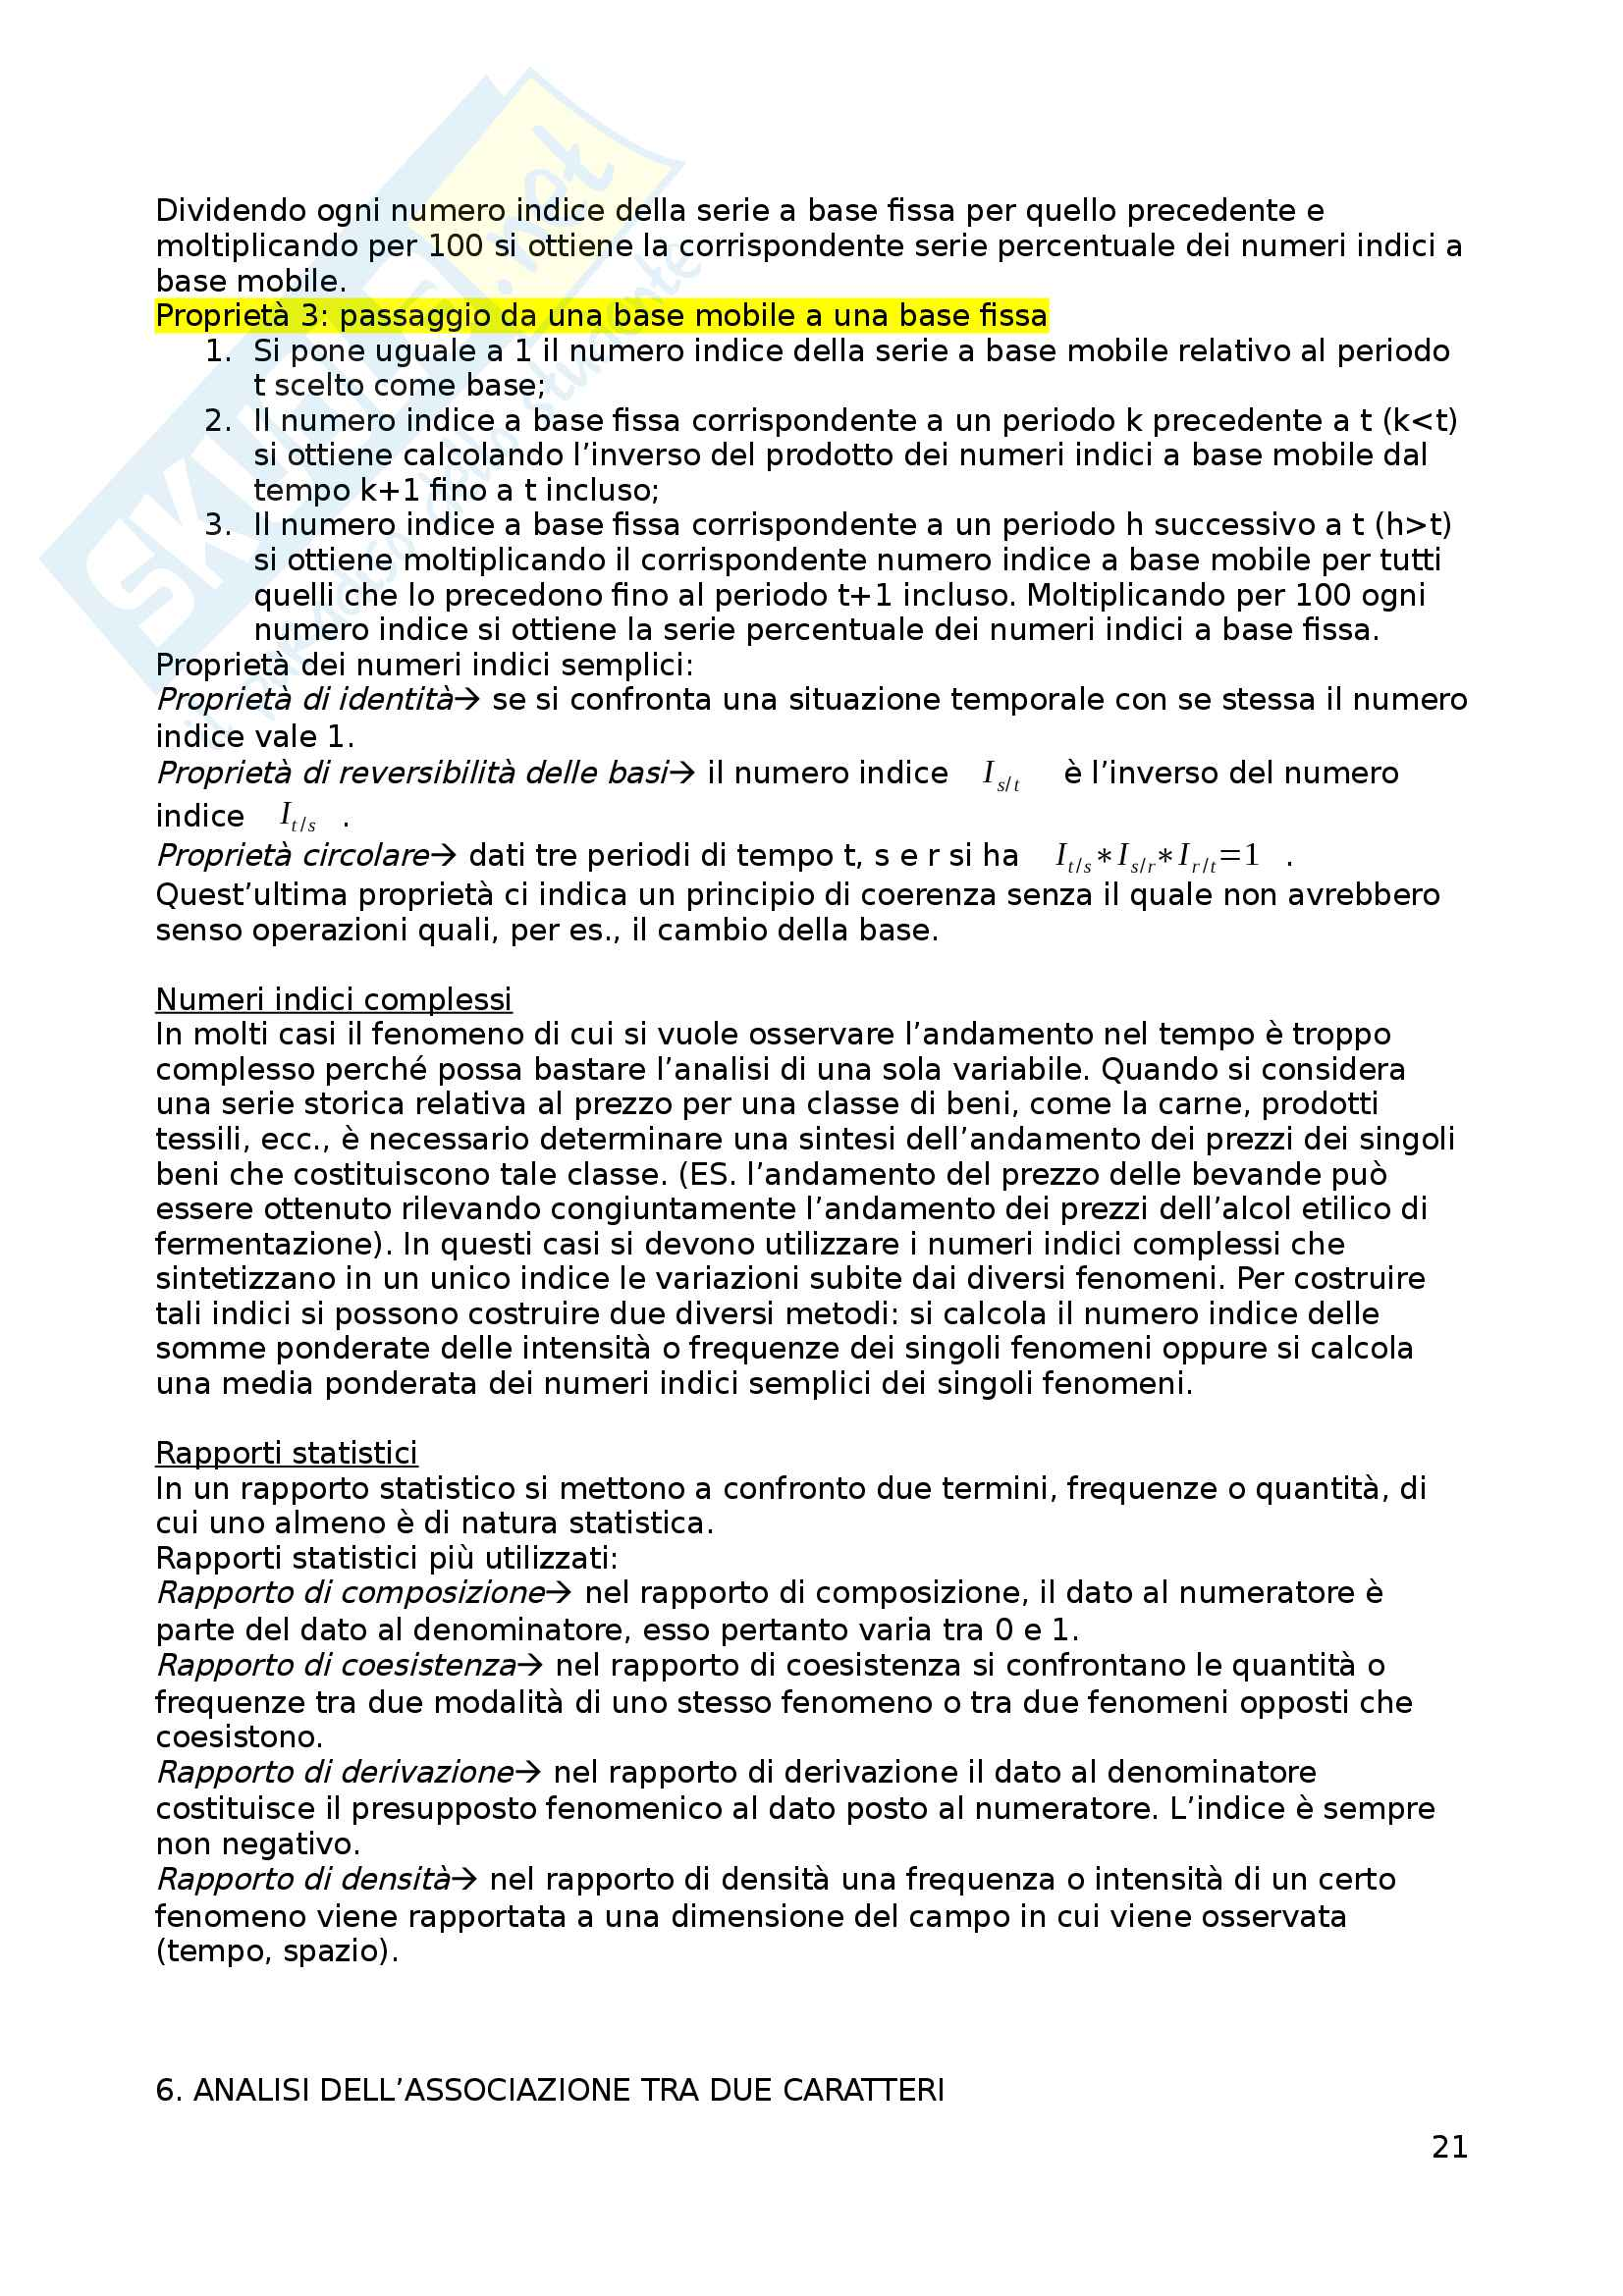 Appunti di Statistica Pag. 21